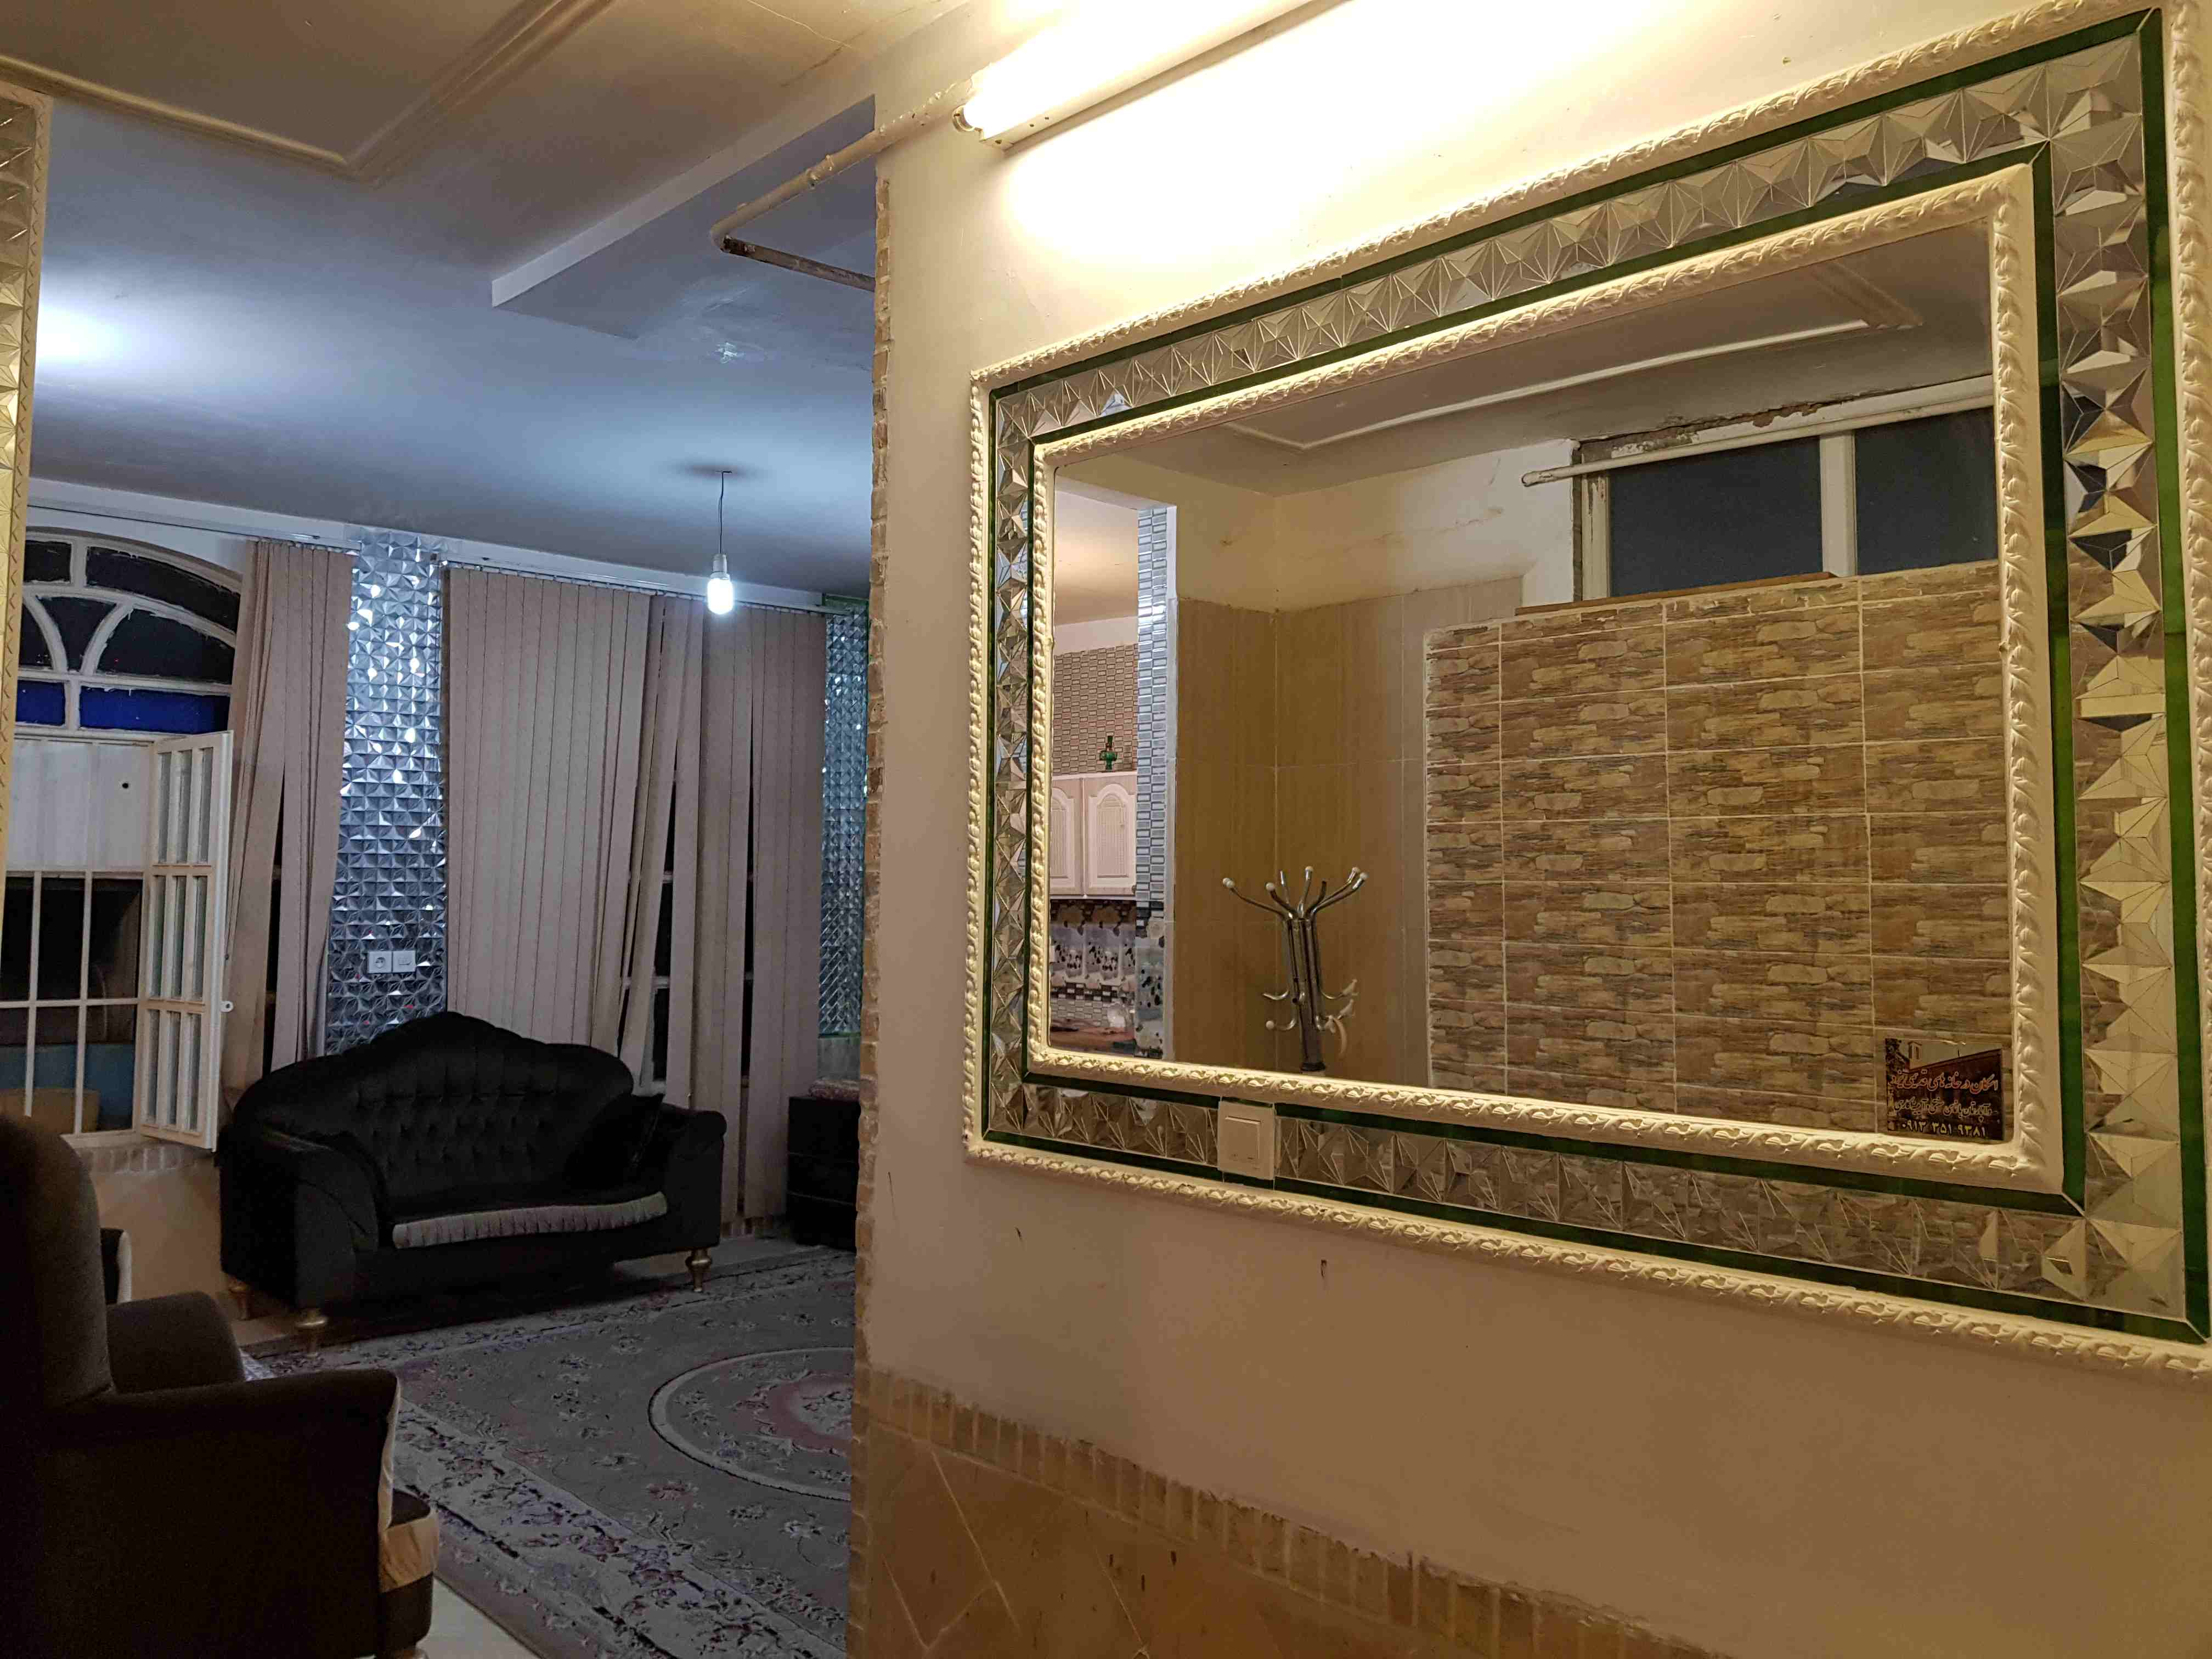 In town آپارتمان مبله در رجایی یزد